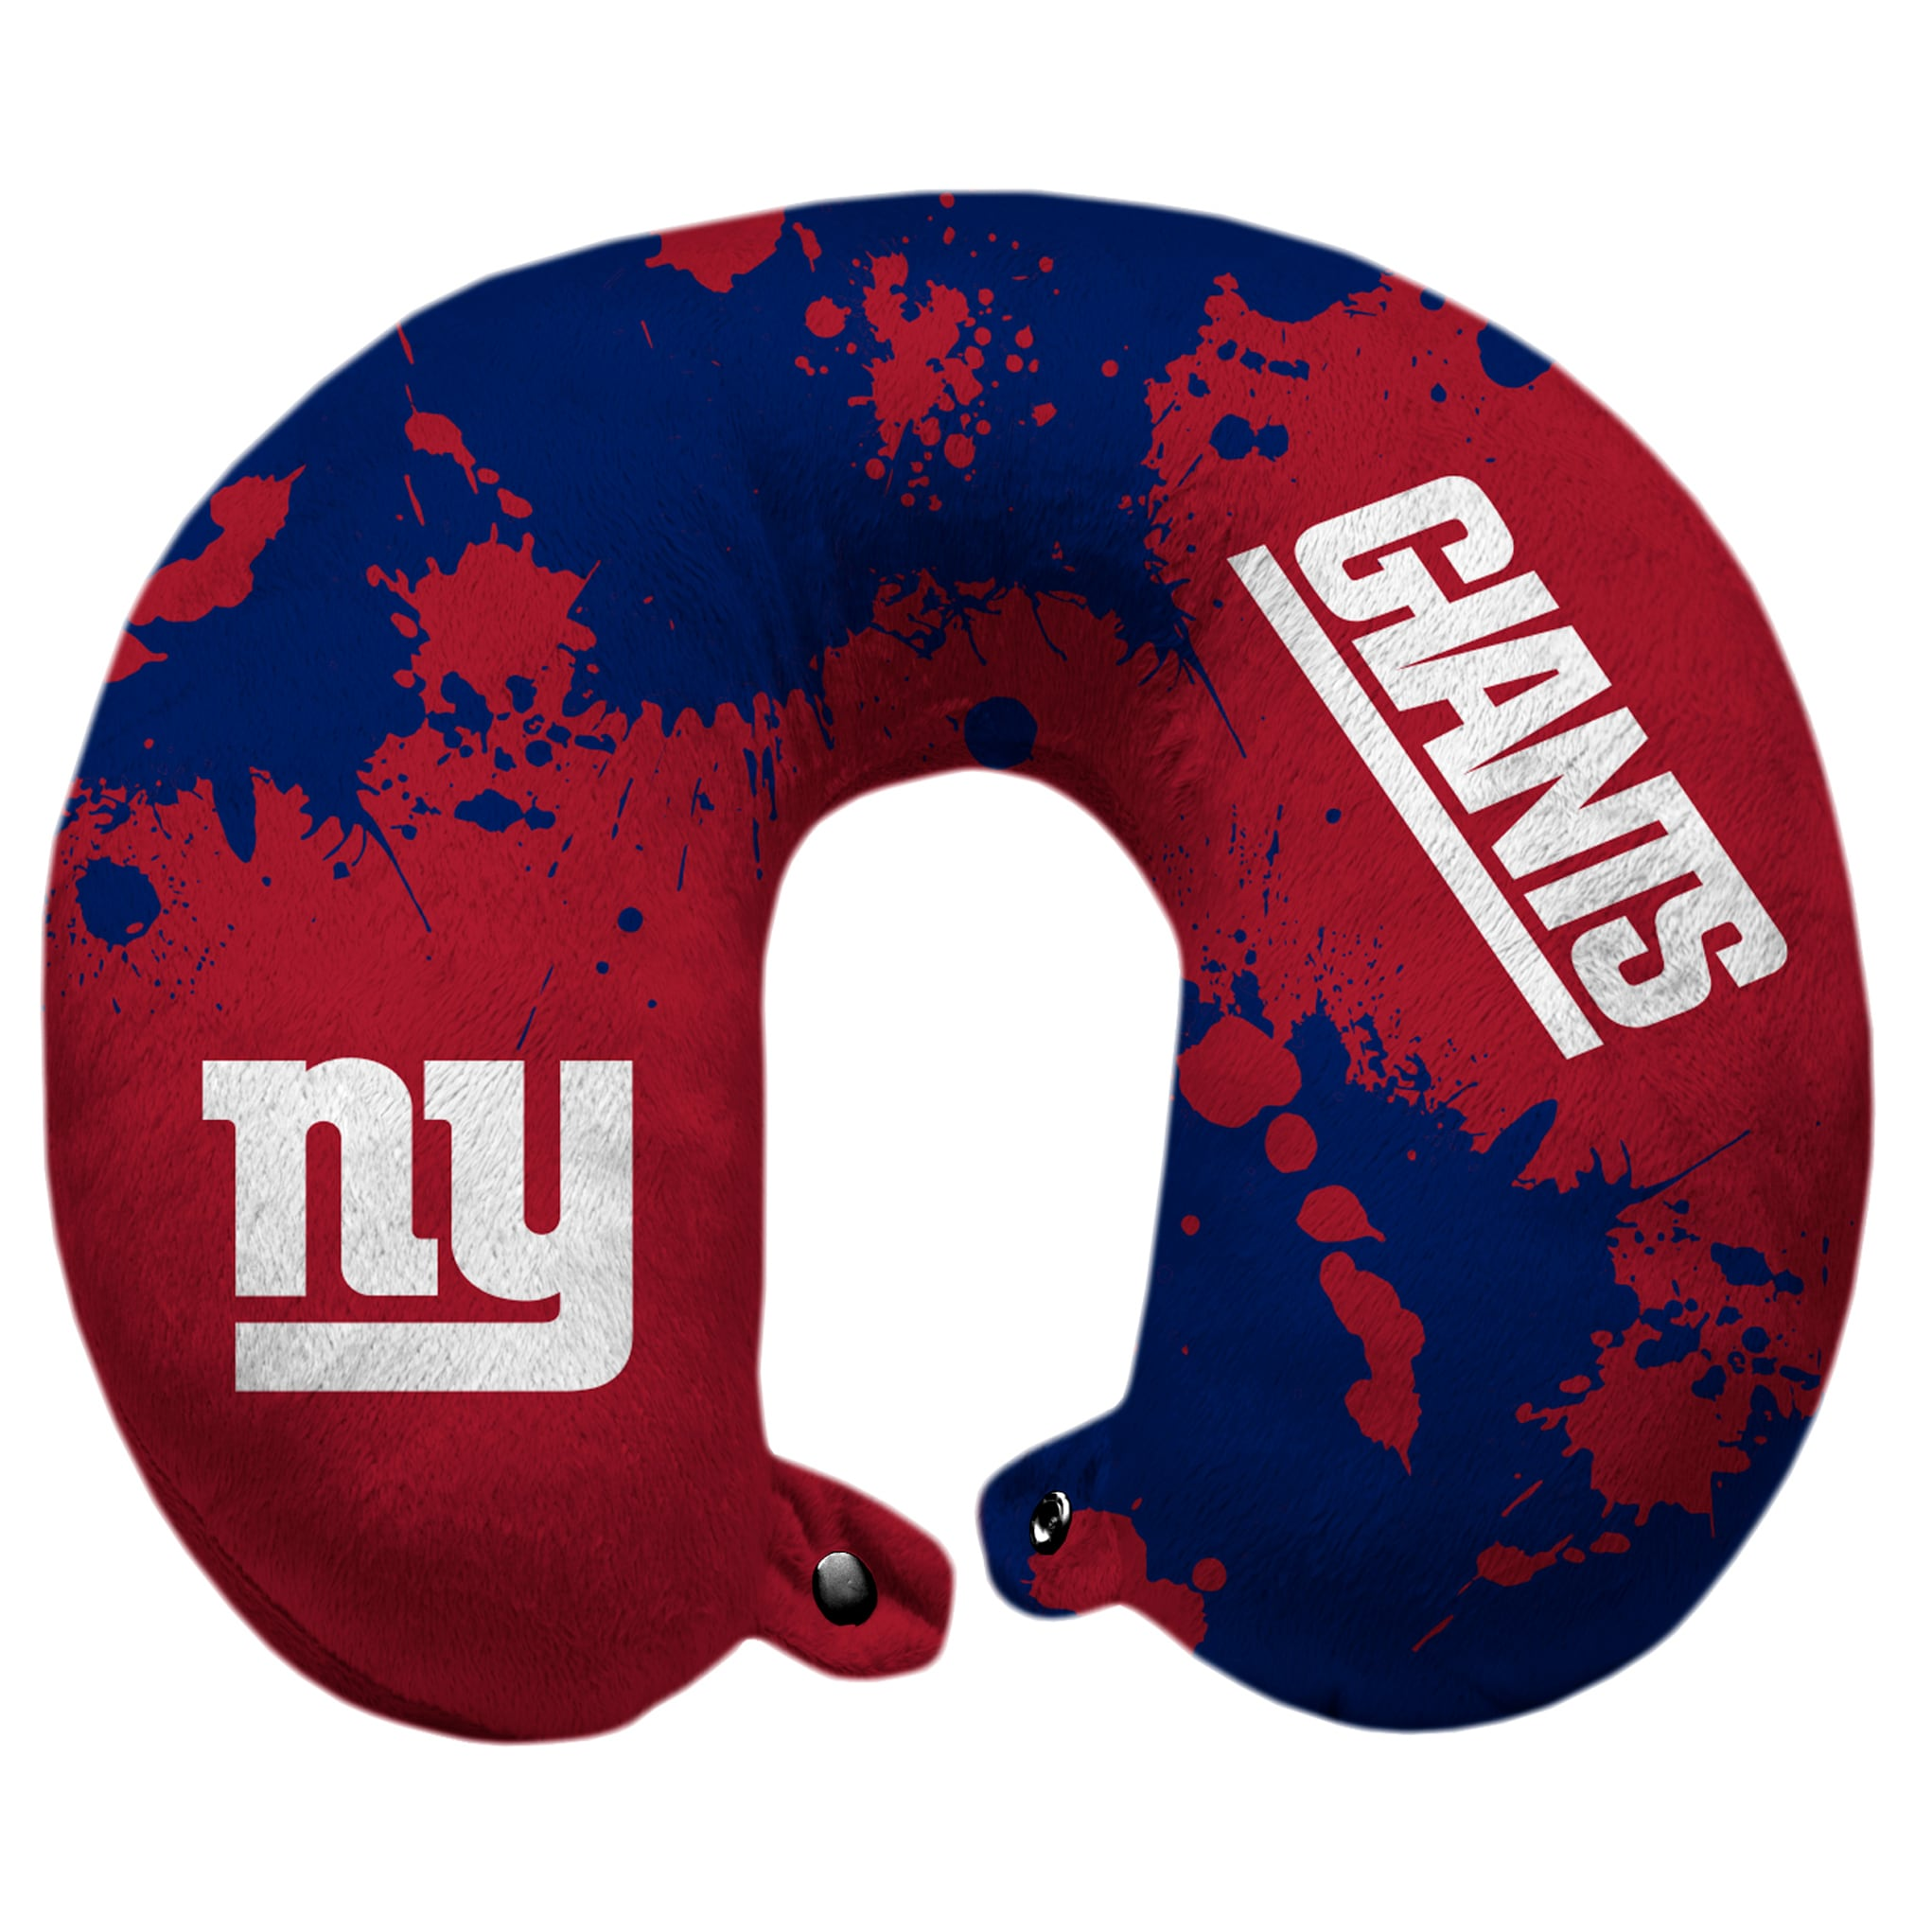 New York Giants Splatter Polyester Snap Closure Travel Pillow - Blue